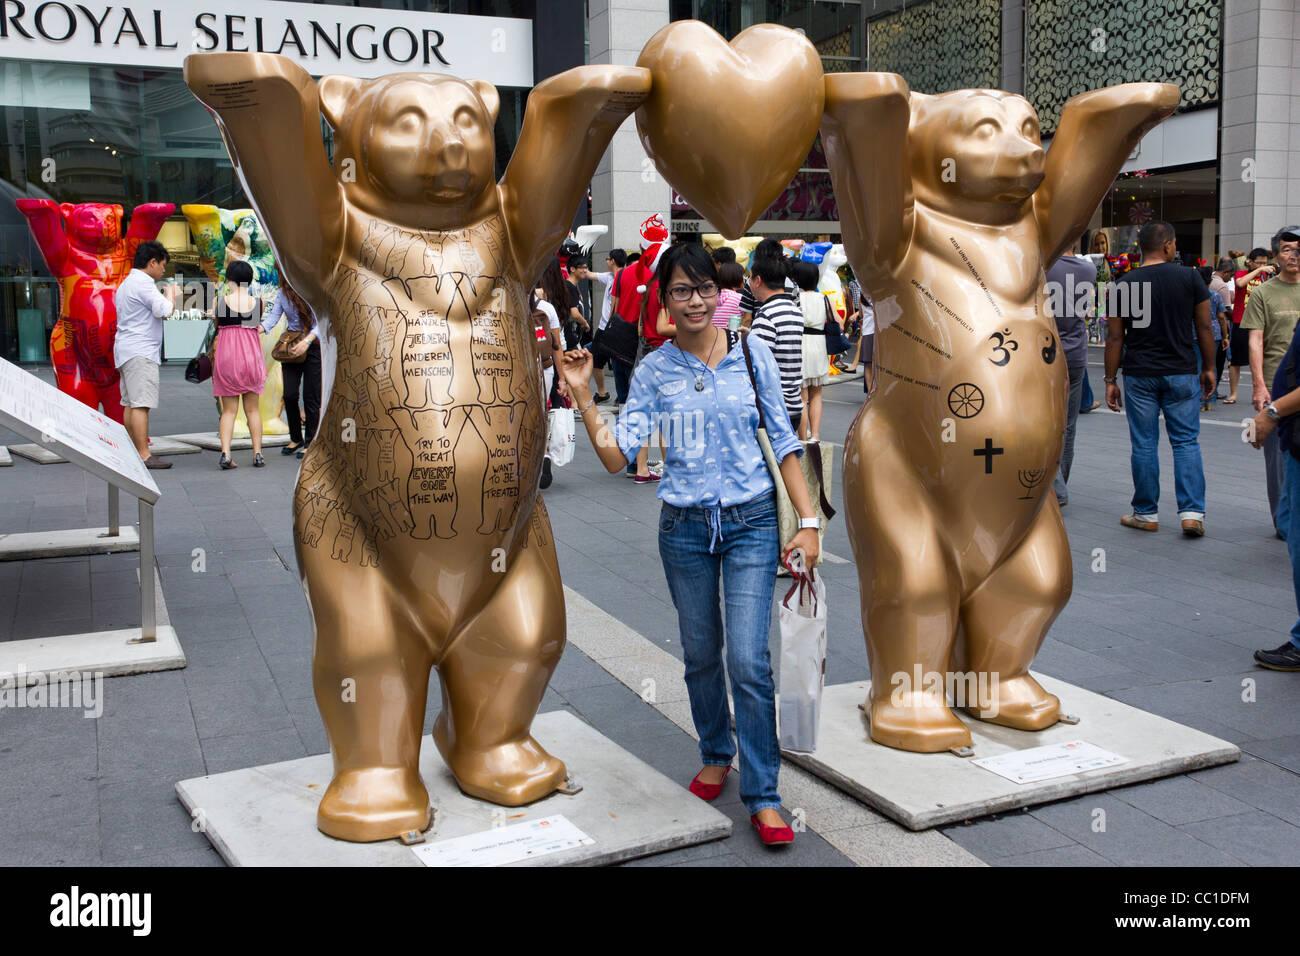 girl posing for photograph, United Buddy Bears exhibition, Pavilion Mall, Kuala Lumpur, Malaysia - Stock Image